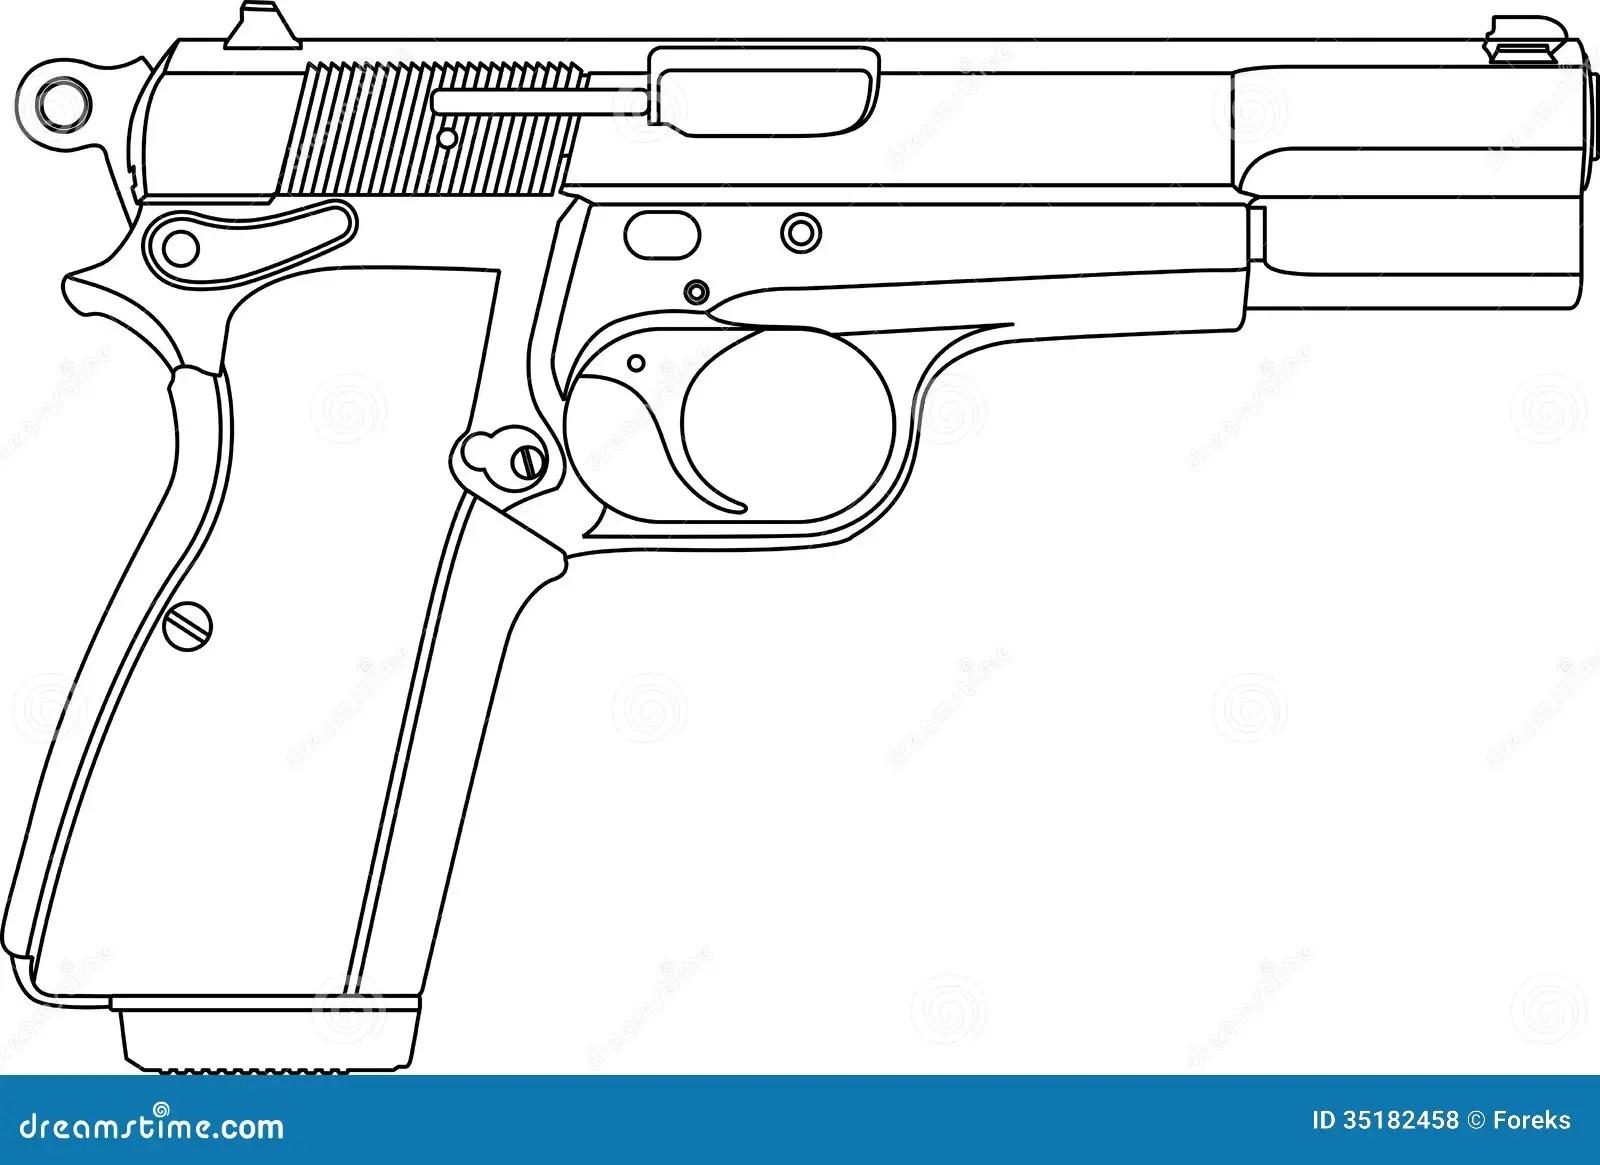 Wireframe Gun Pistol Royalty Free Stock Photos